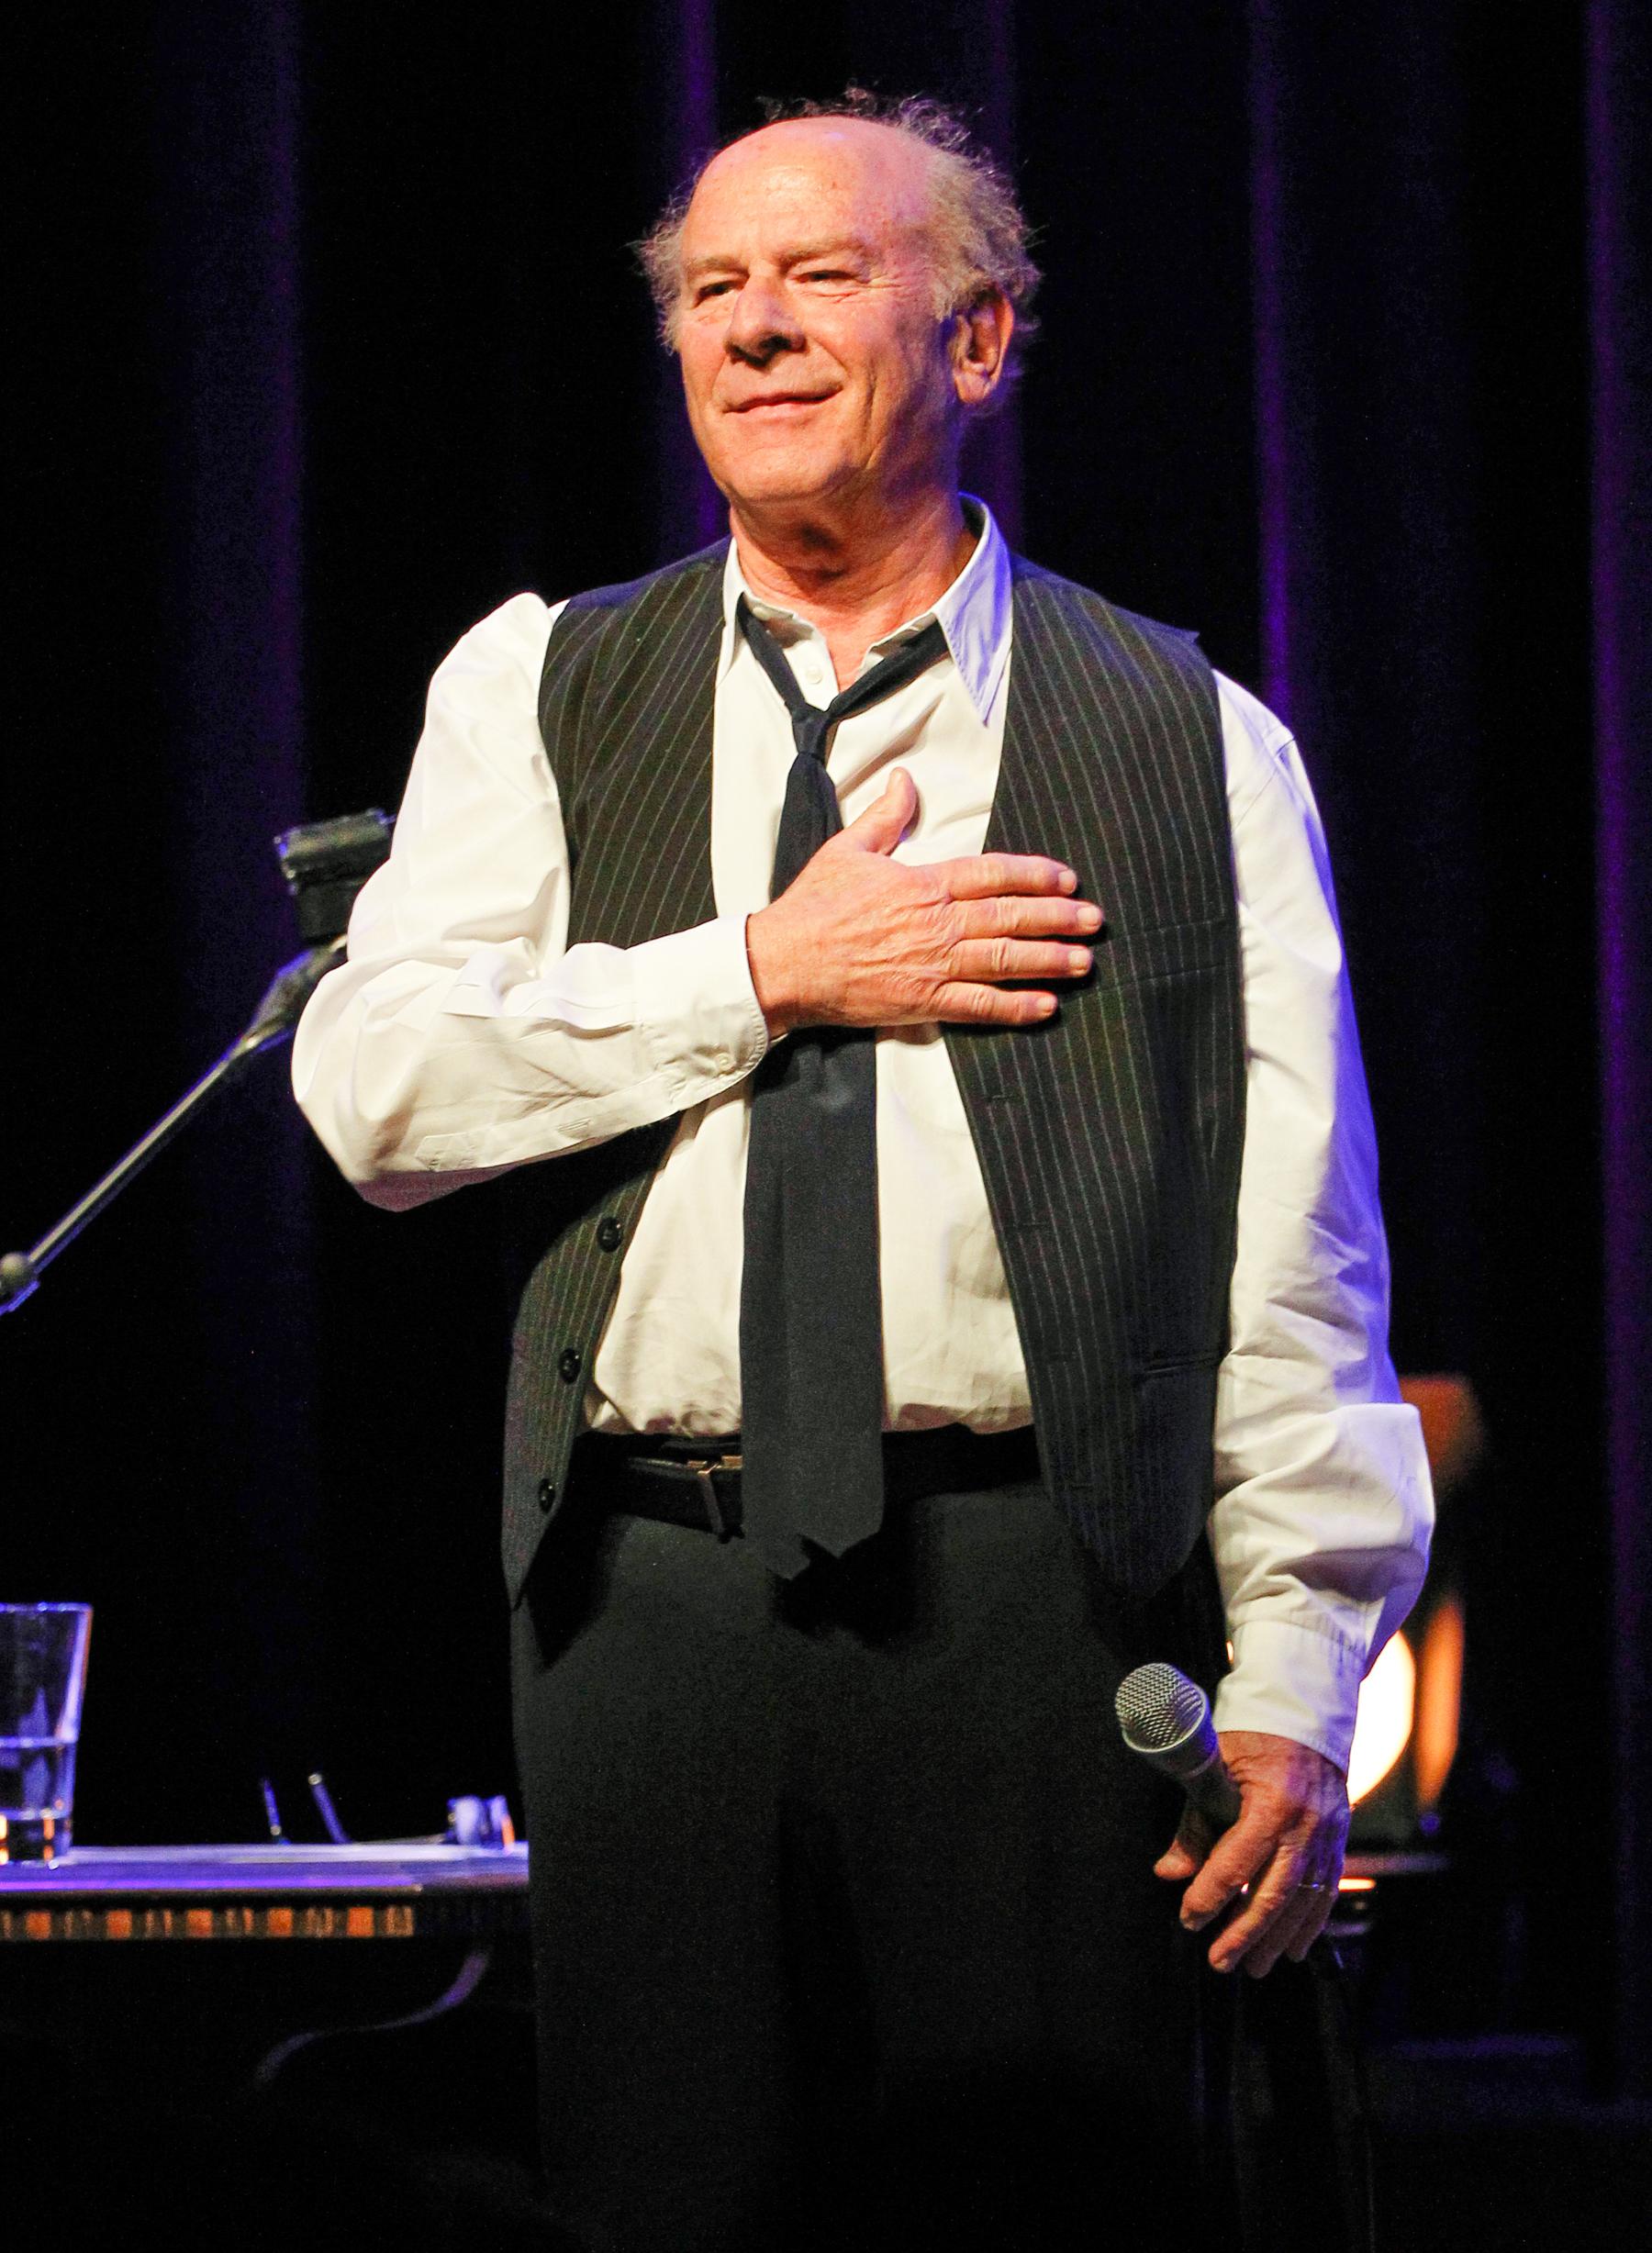 Art Garfunkel Is Ecstatic: 'My Voice Is 96 Percent Back'